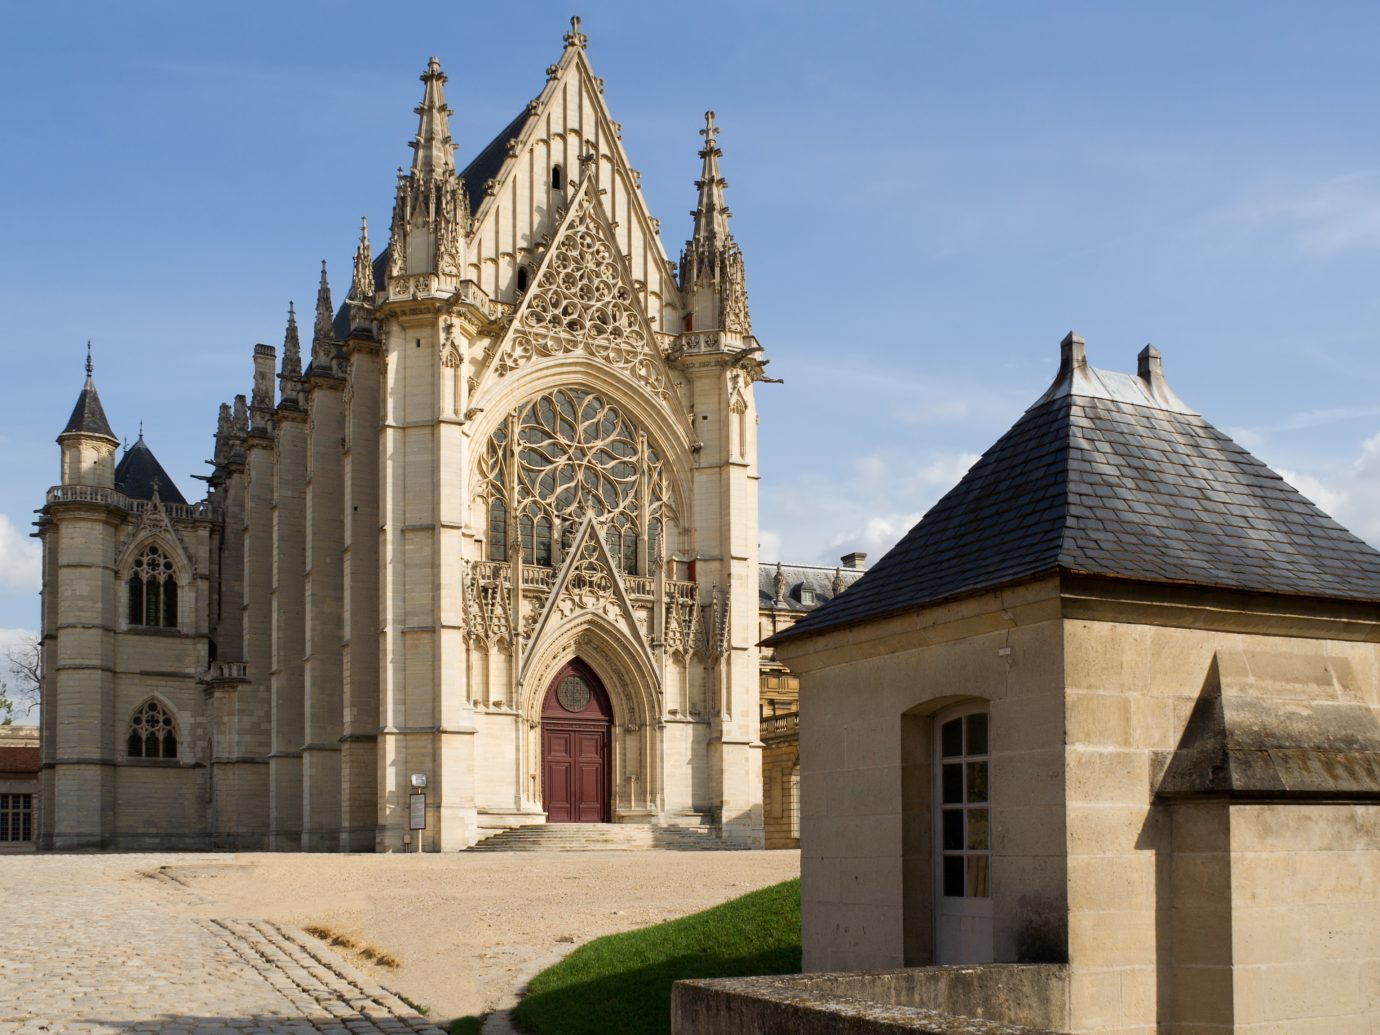 The Sainte-Chapelle, founded in 1379 inside the Vincennes Castle near Paris, France